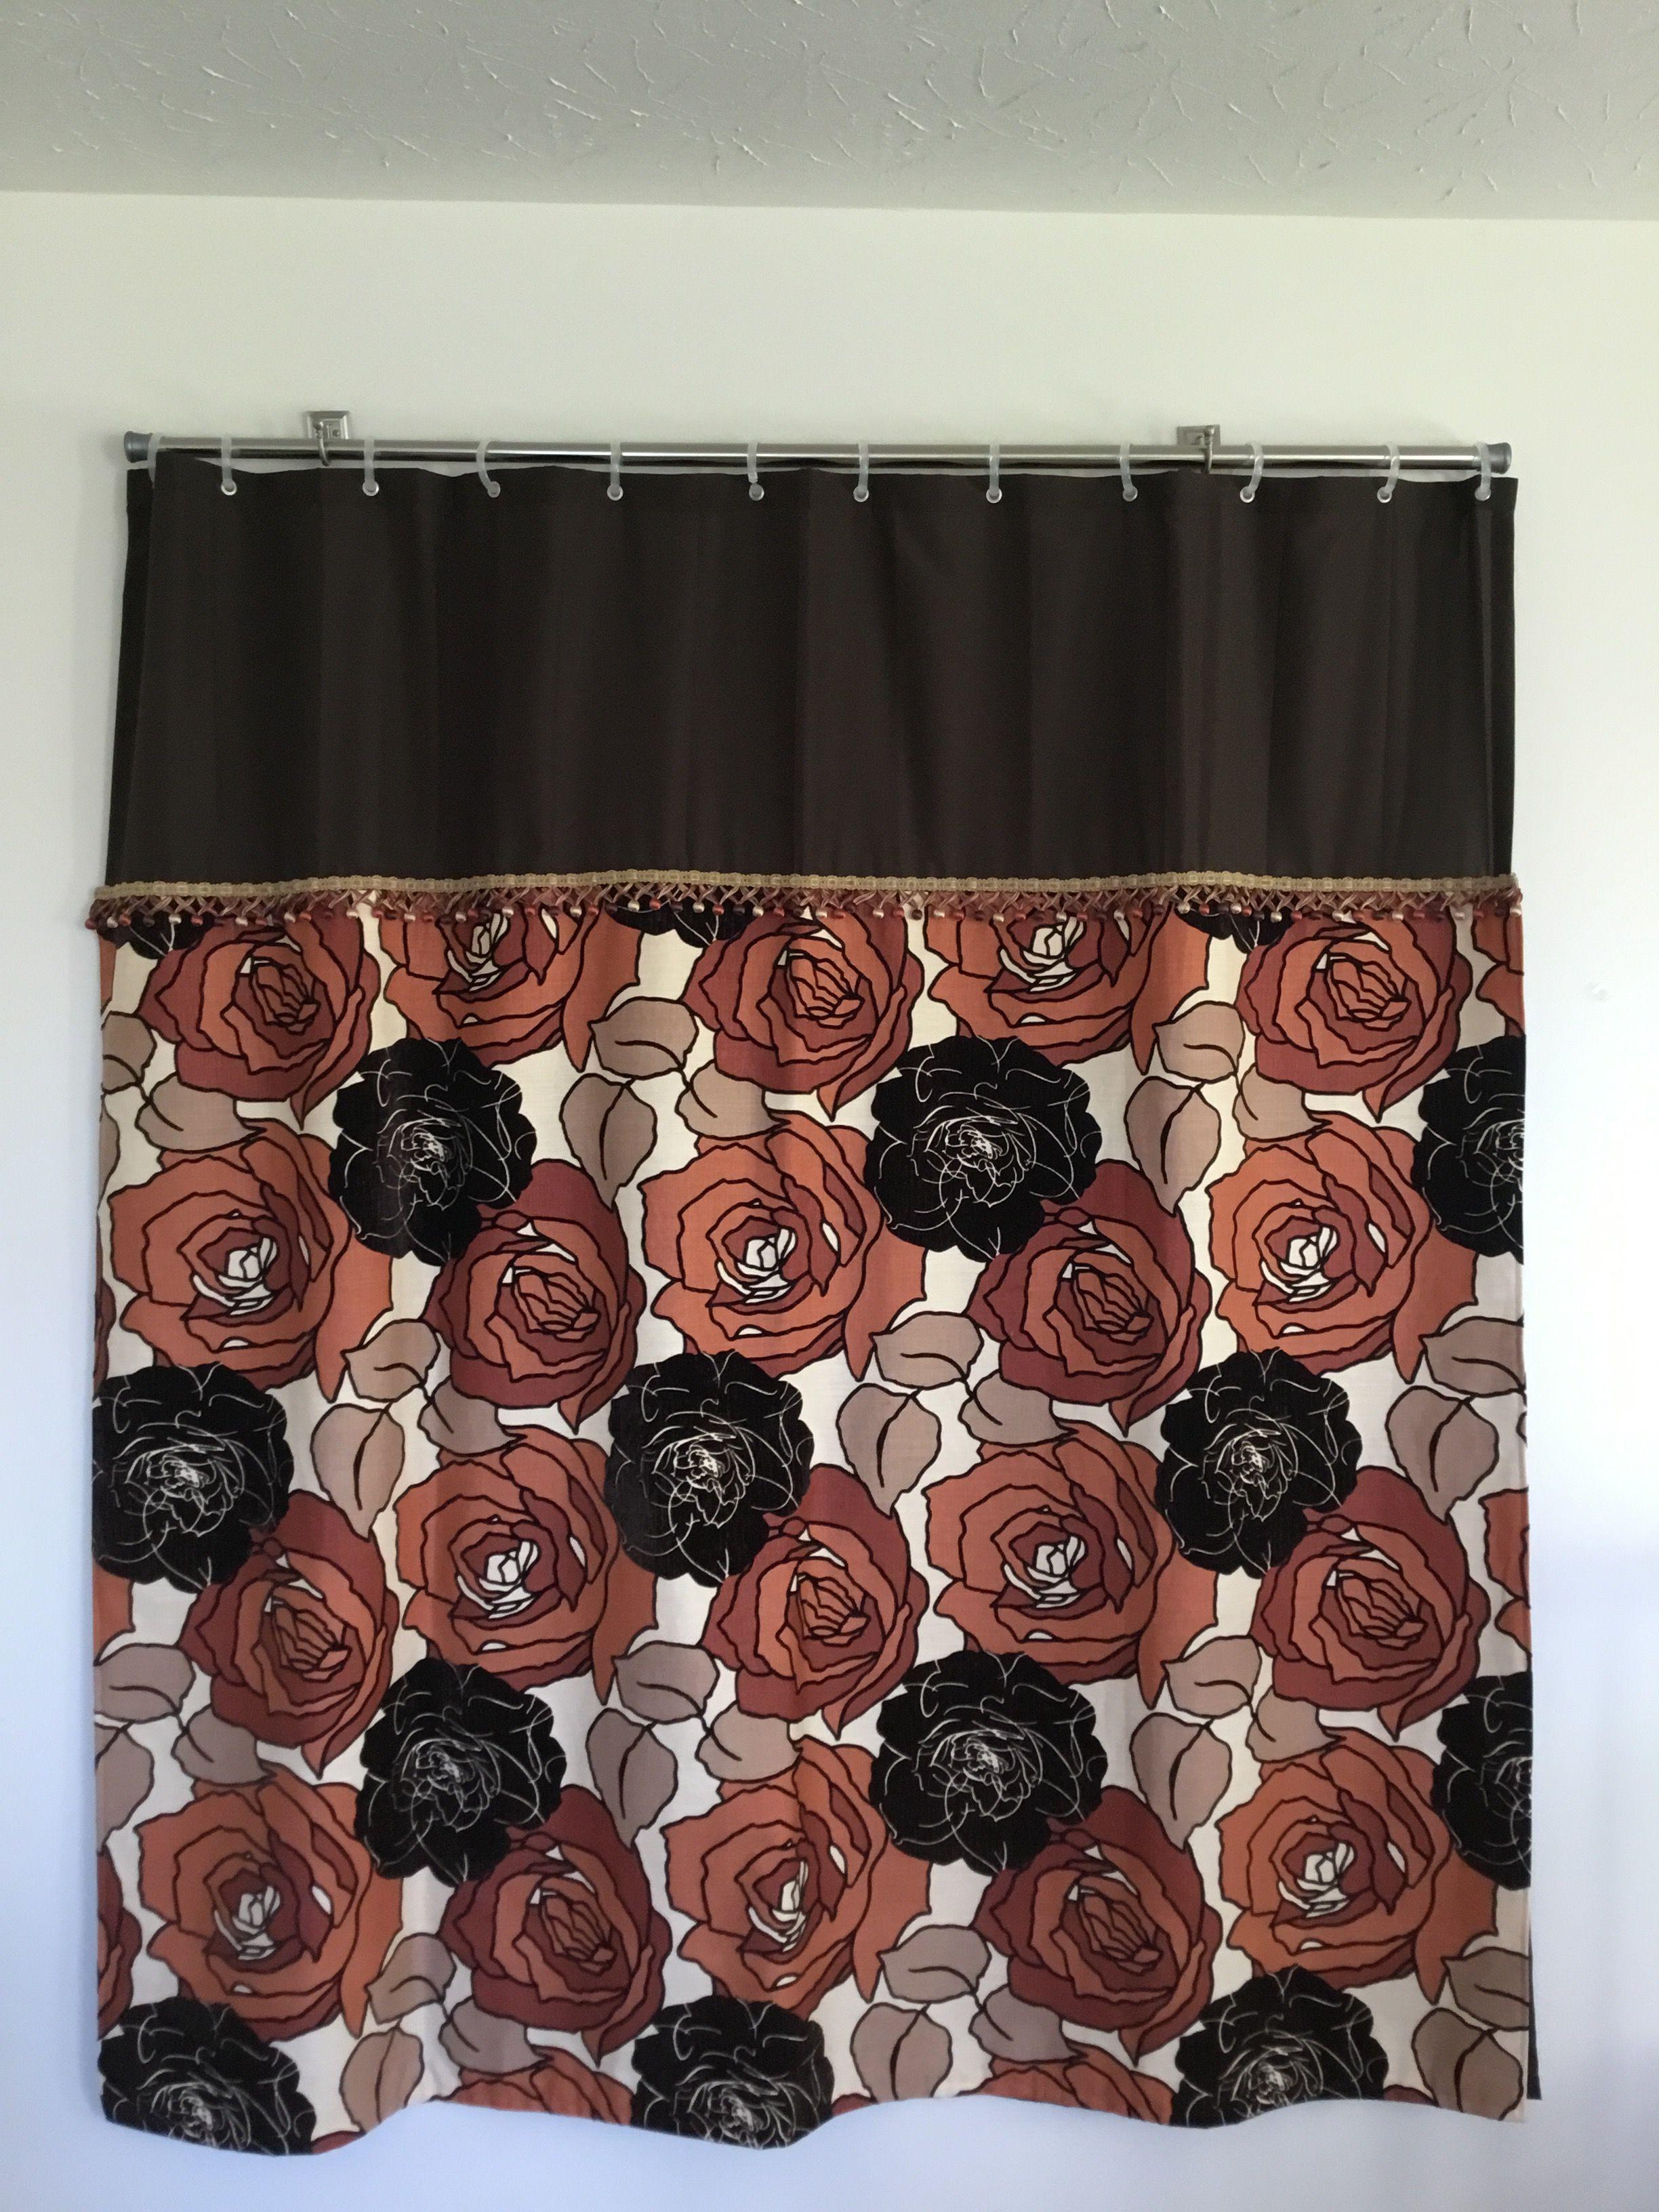 Very Unique Shower Curtain The Dark Brown On Orange Flowers Is Velvet Uniquelydesignedshowercurtainsgmail